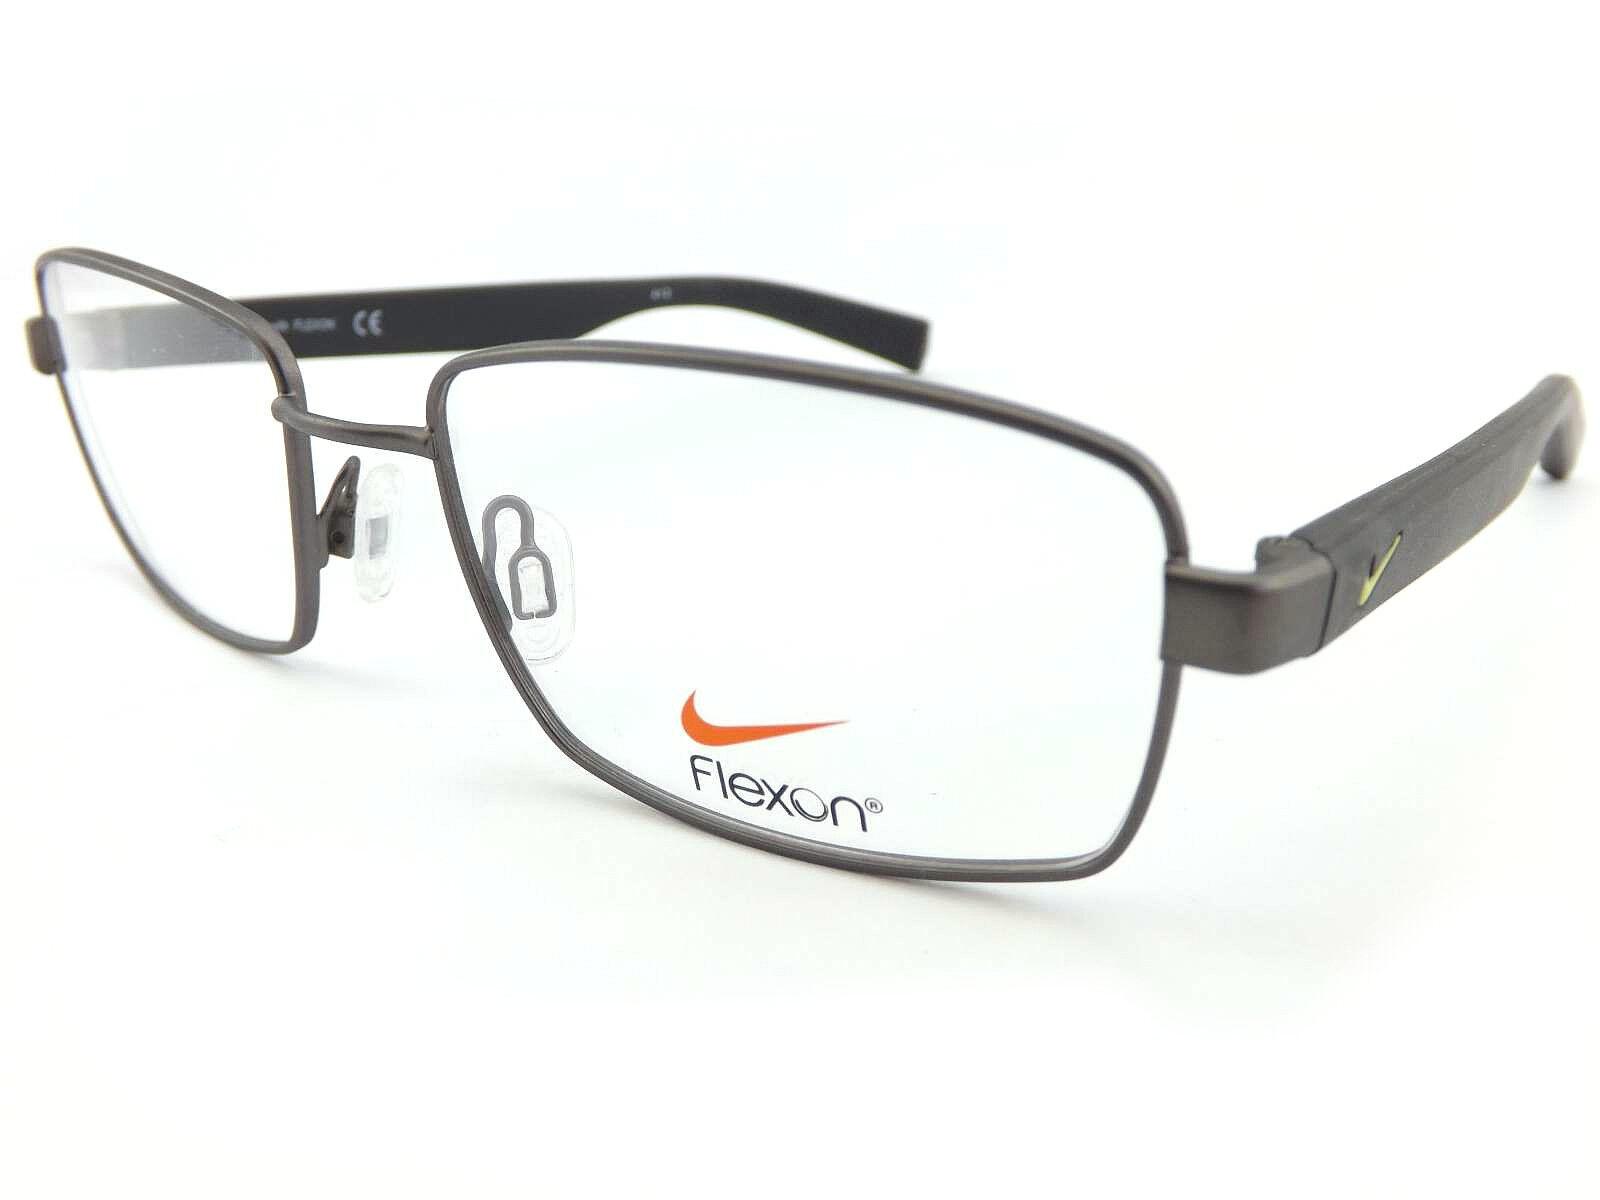 NIKE FLEXON +0.25 to +3.50 52mm Reading Glasses Gunmetal / Black ...